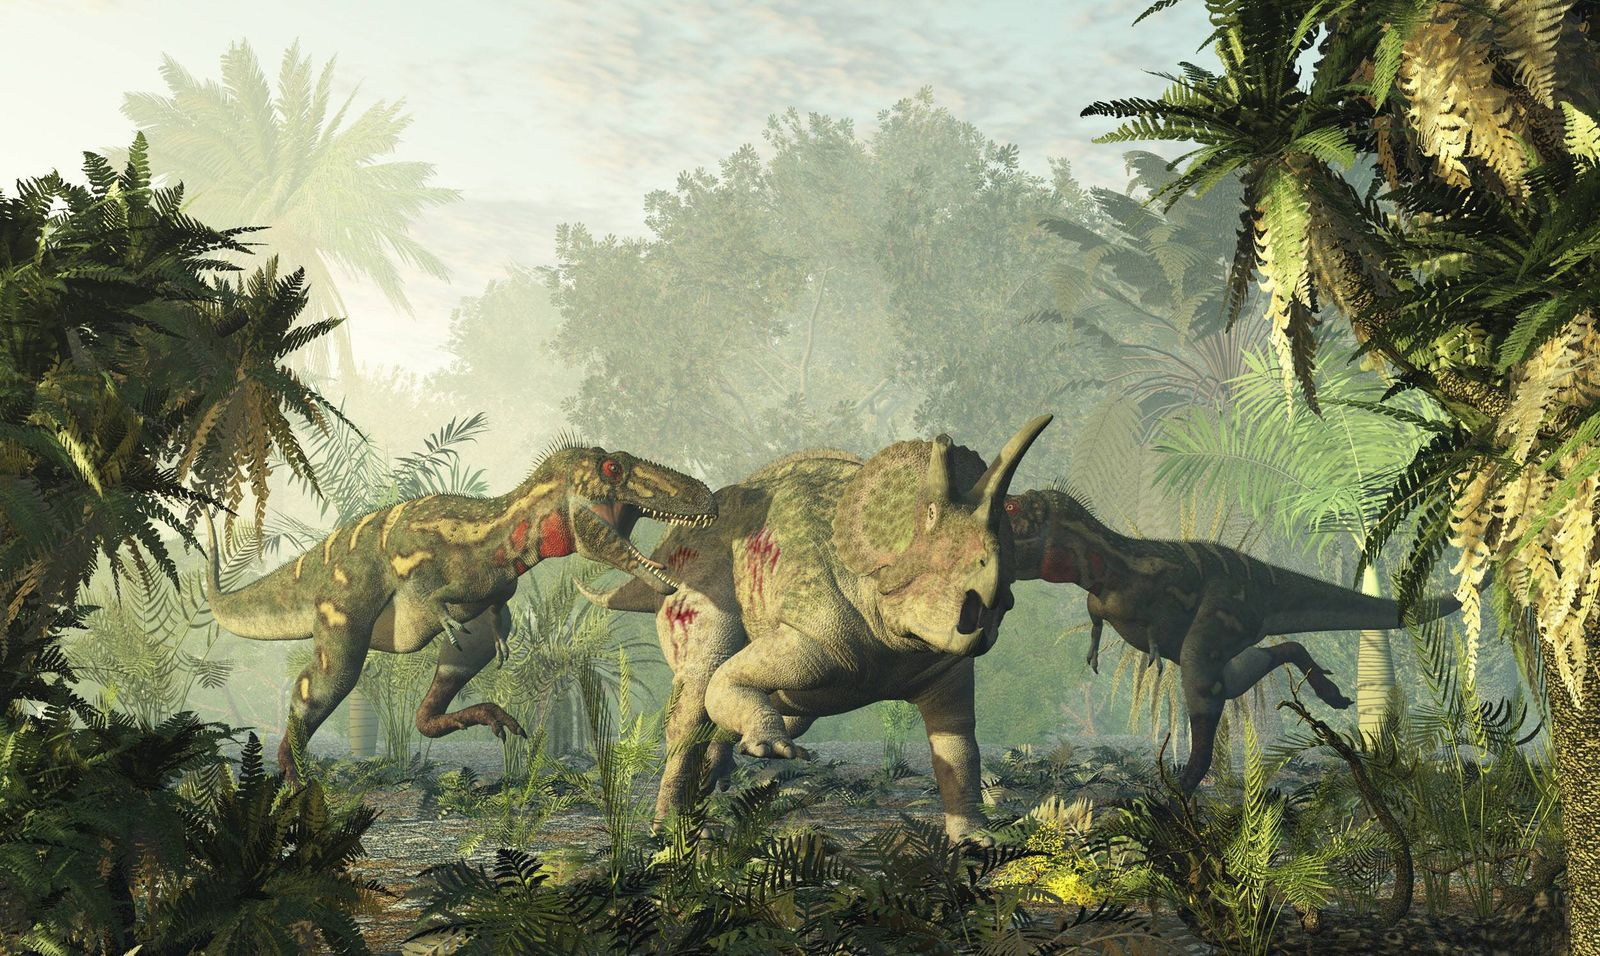 Nanotyrannus et triceratops Nanotyrannus and triceratops Nanotyrannus etait le plus petit membre